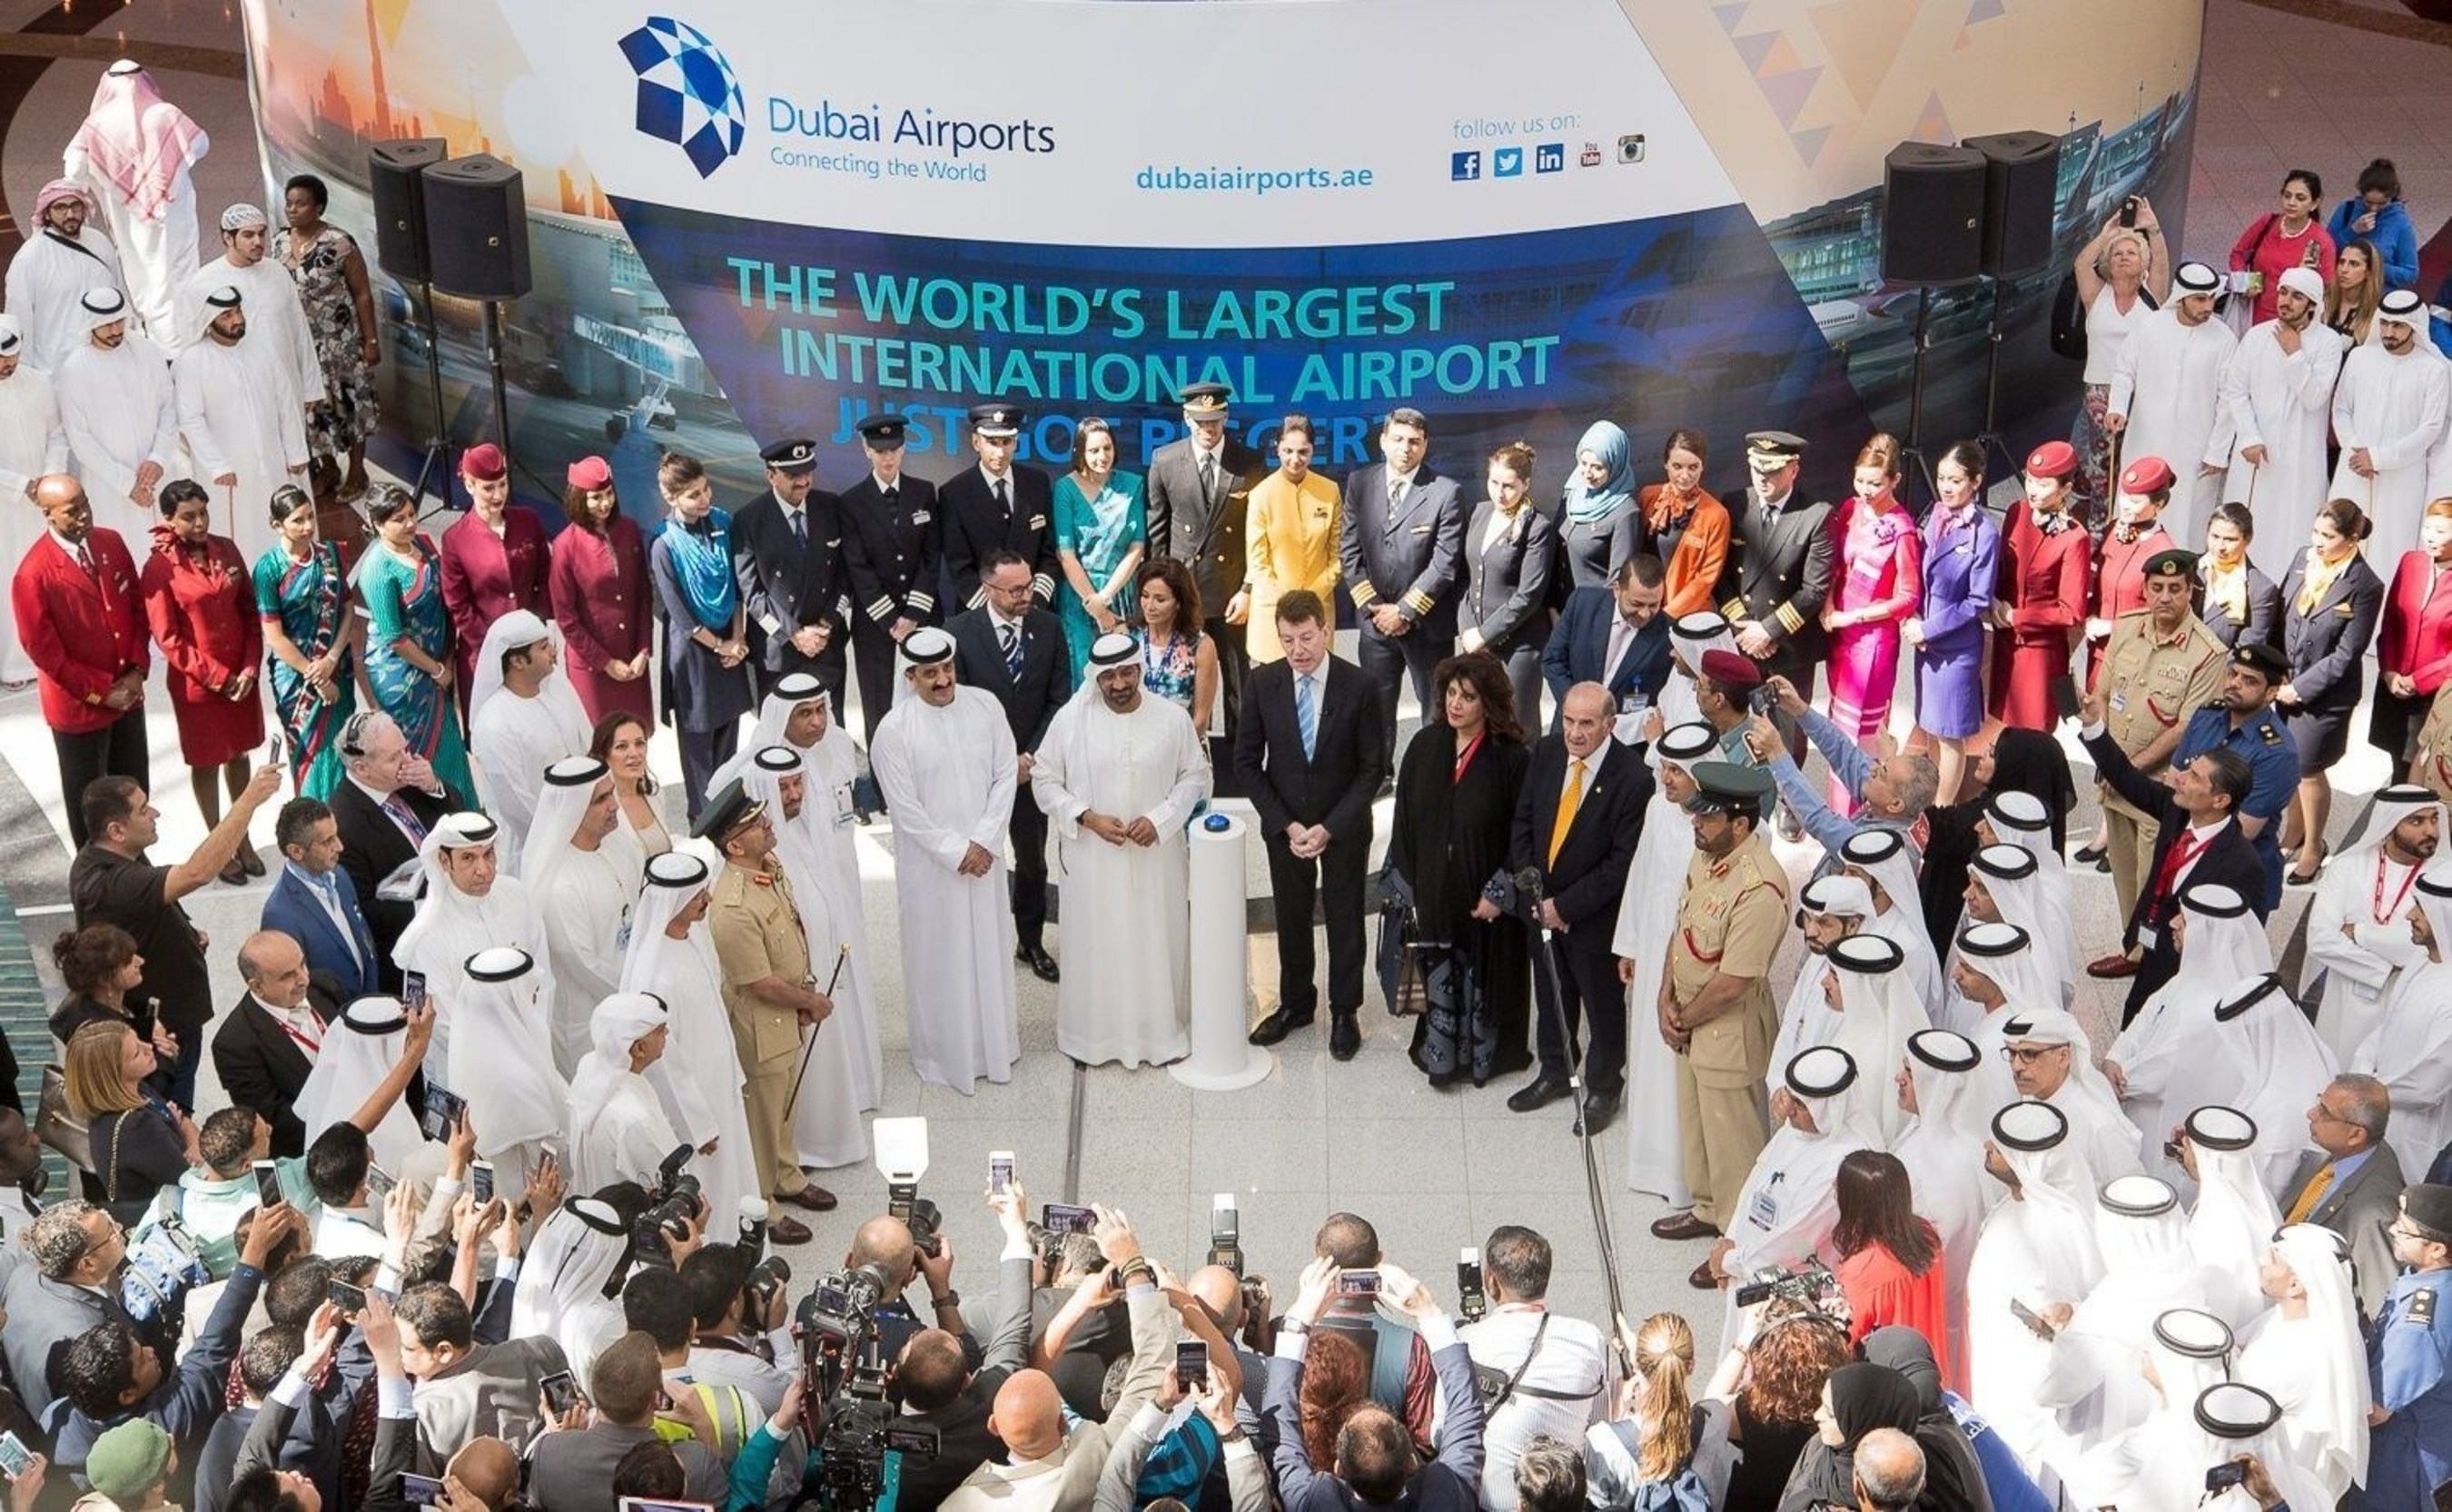 His Highness Sheikh Ahmed Bin Saeed Al Maktoum, Chairman of Dubai Airports, and CEO Paul Griffiths lead the celebrations at Dubai International's Concourse D on Wednesday. (PRNewsFoto/Dubai Airports)